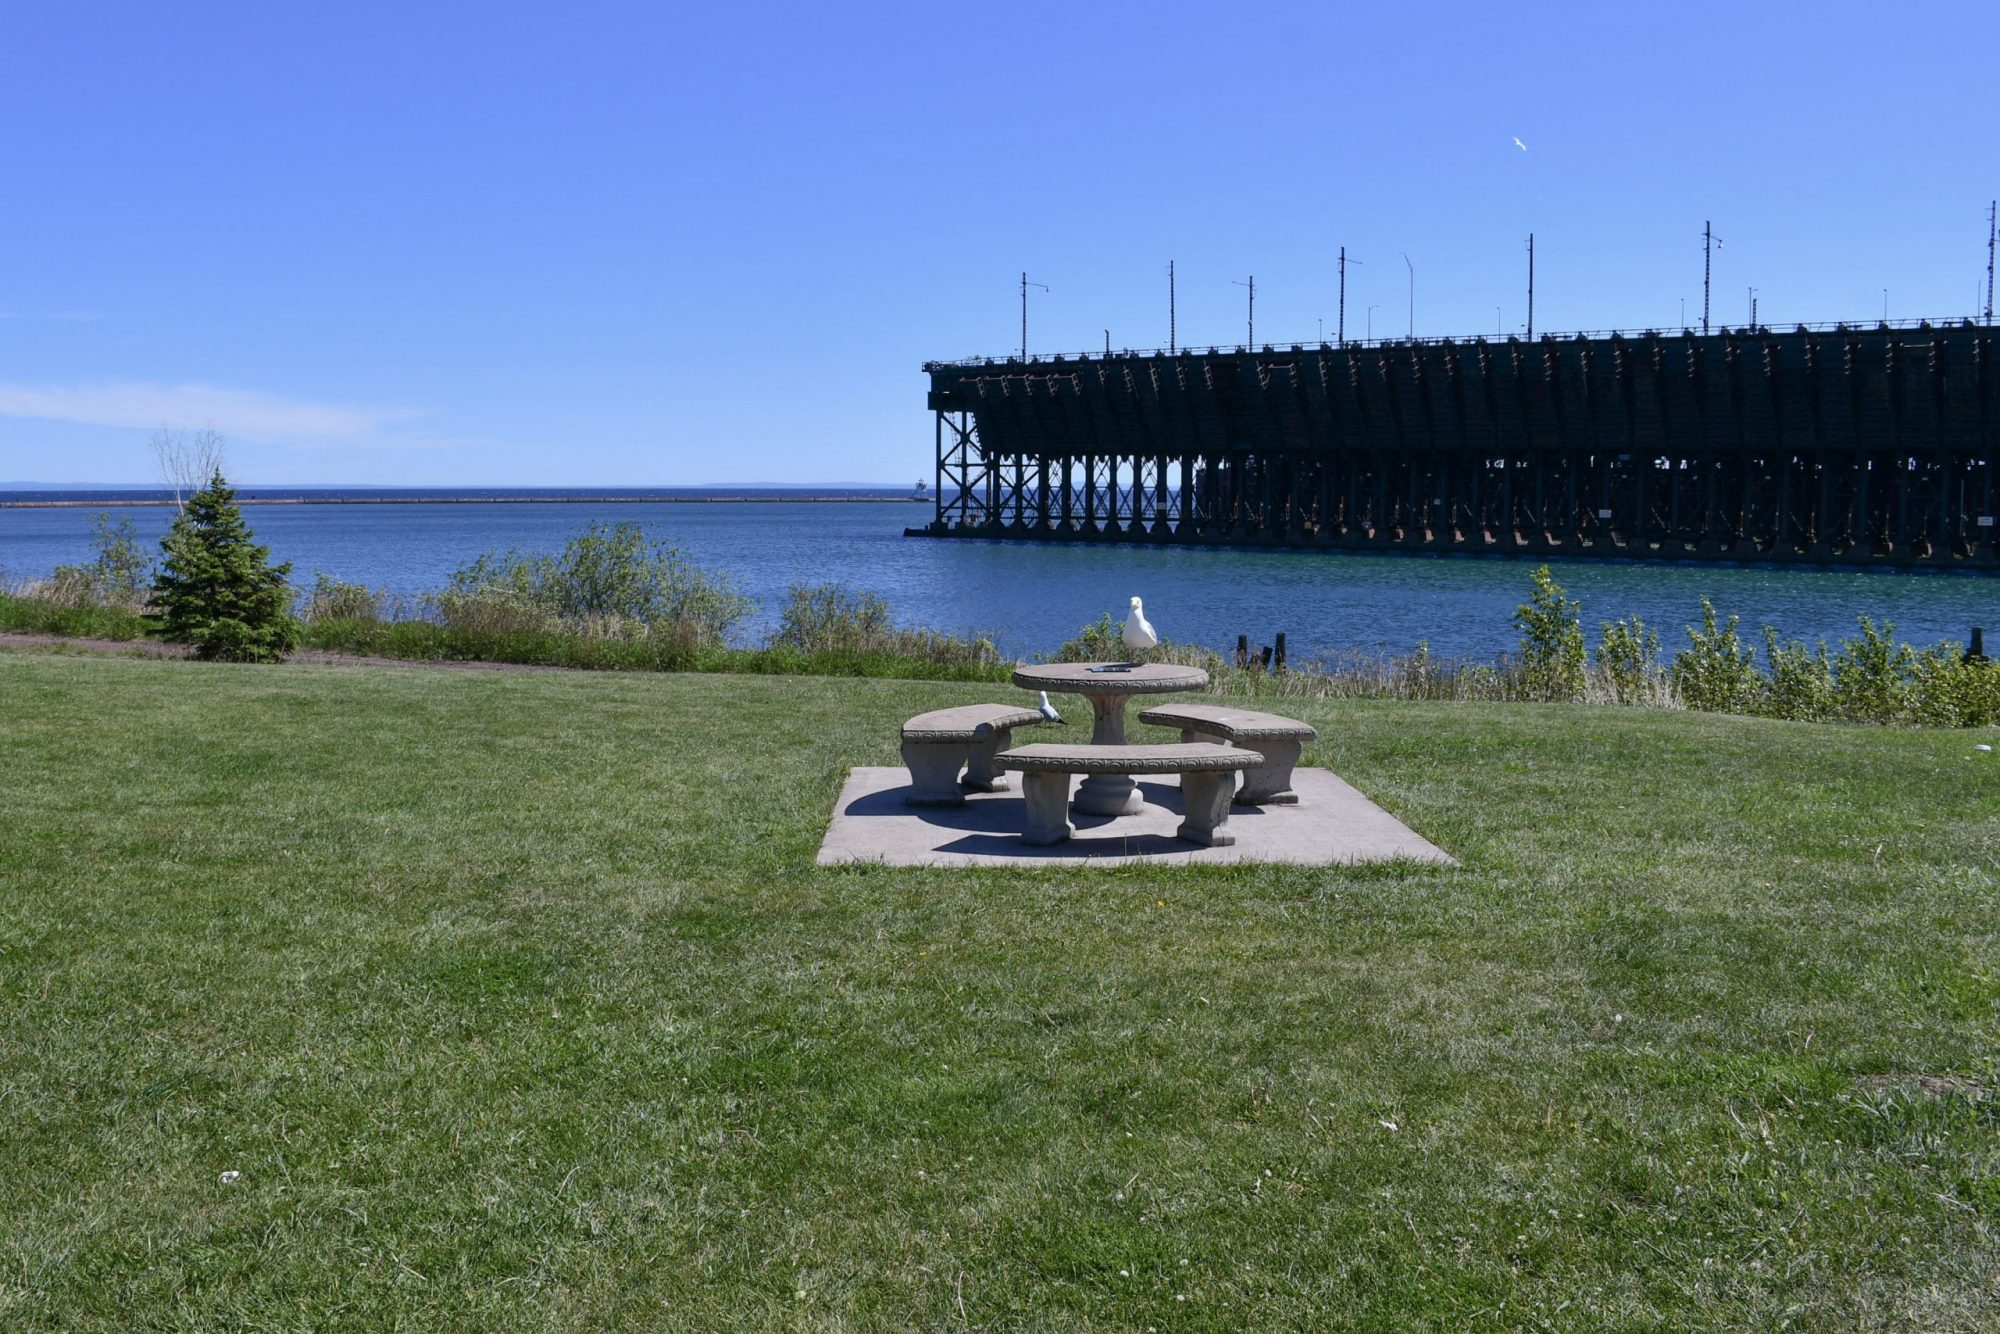 Paul Van Hoven Park, Two Harbors. North Shore Picnic Area